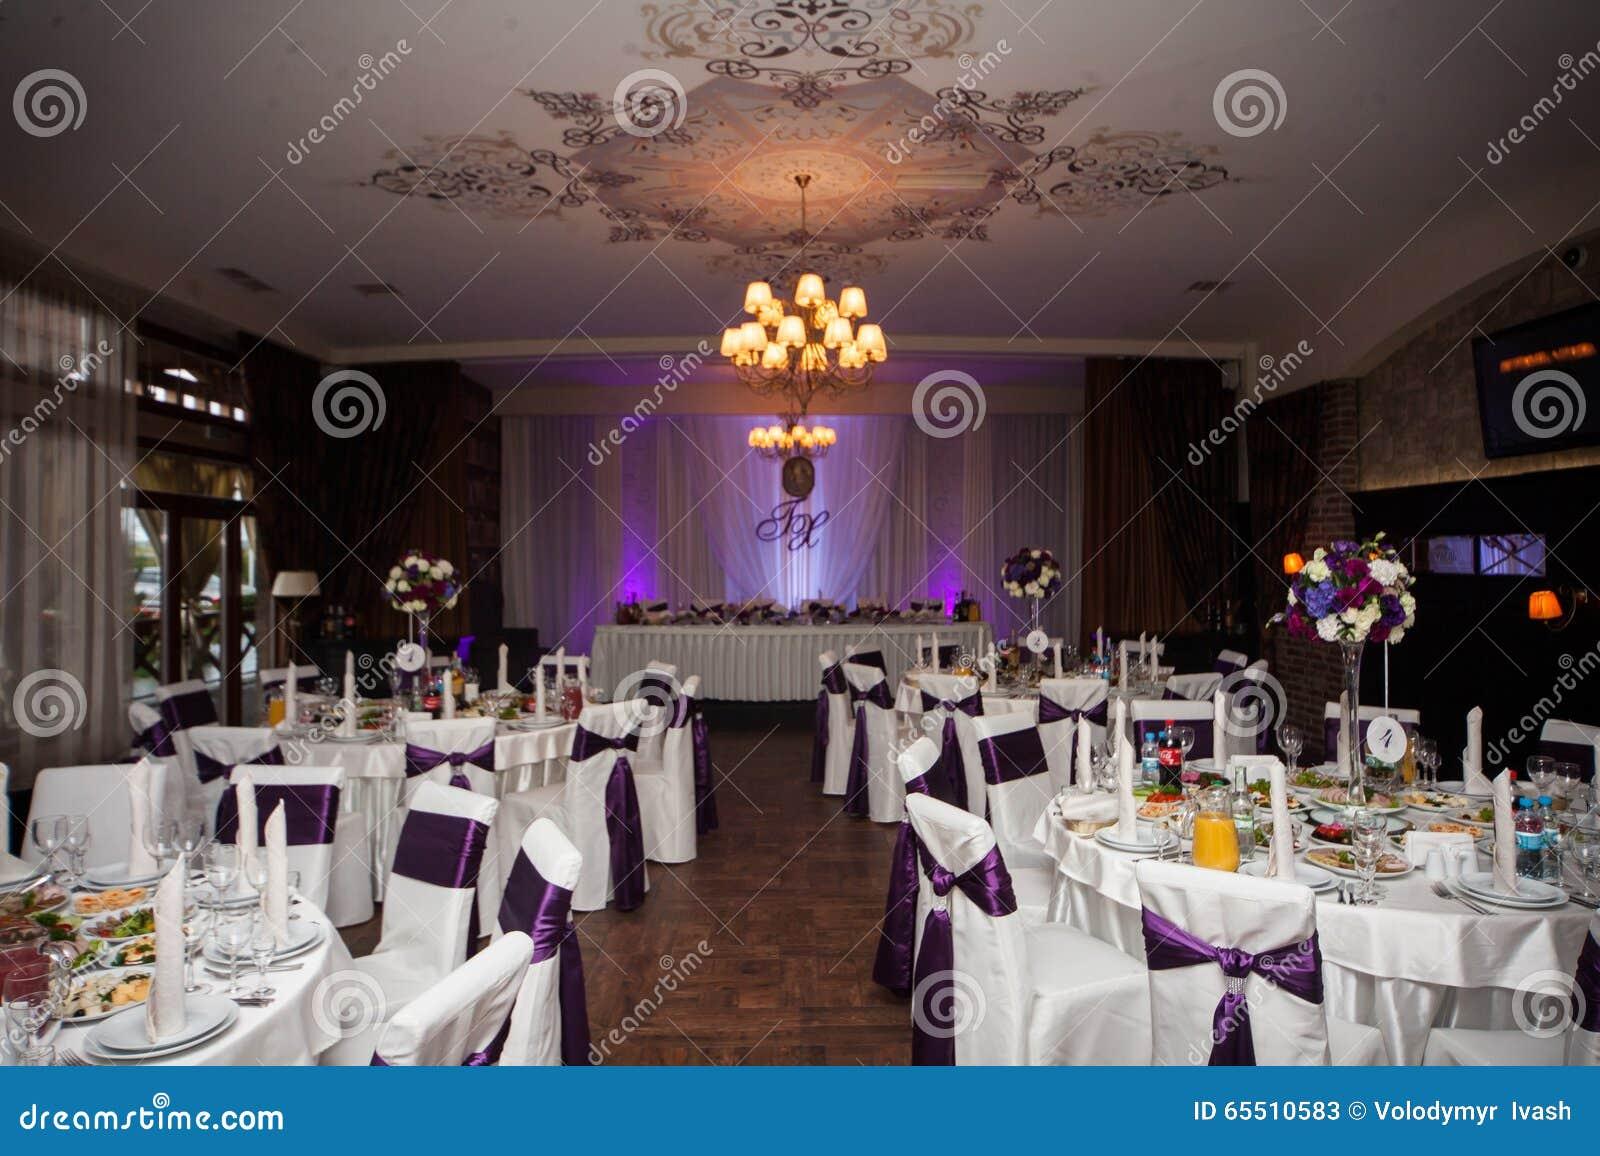 Elegant And Stylish Purple Color Wedding Reception At Luxury